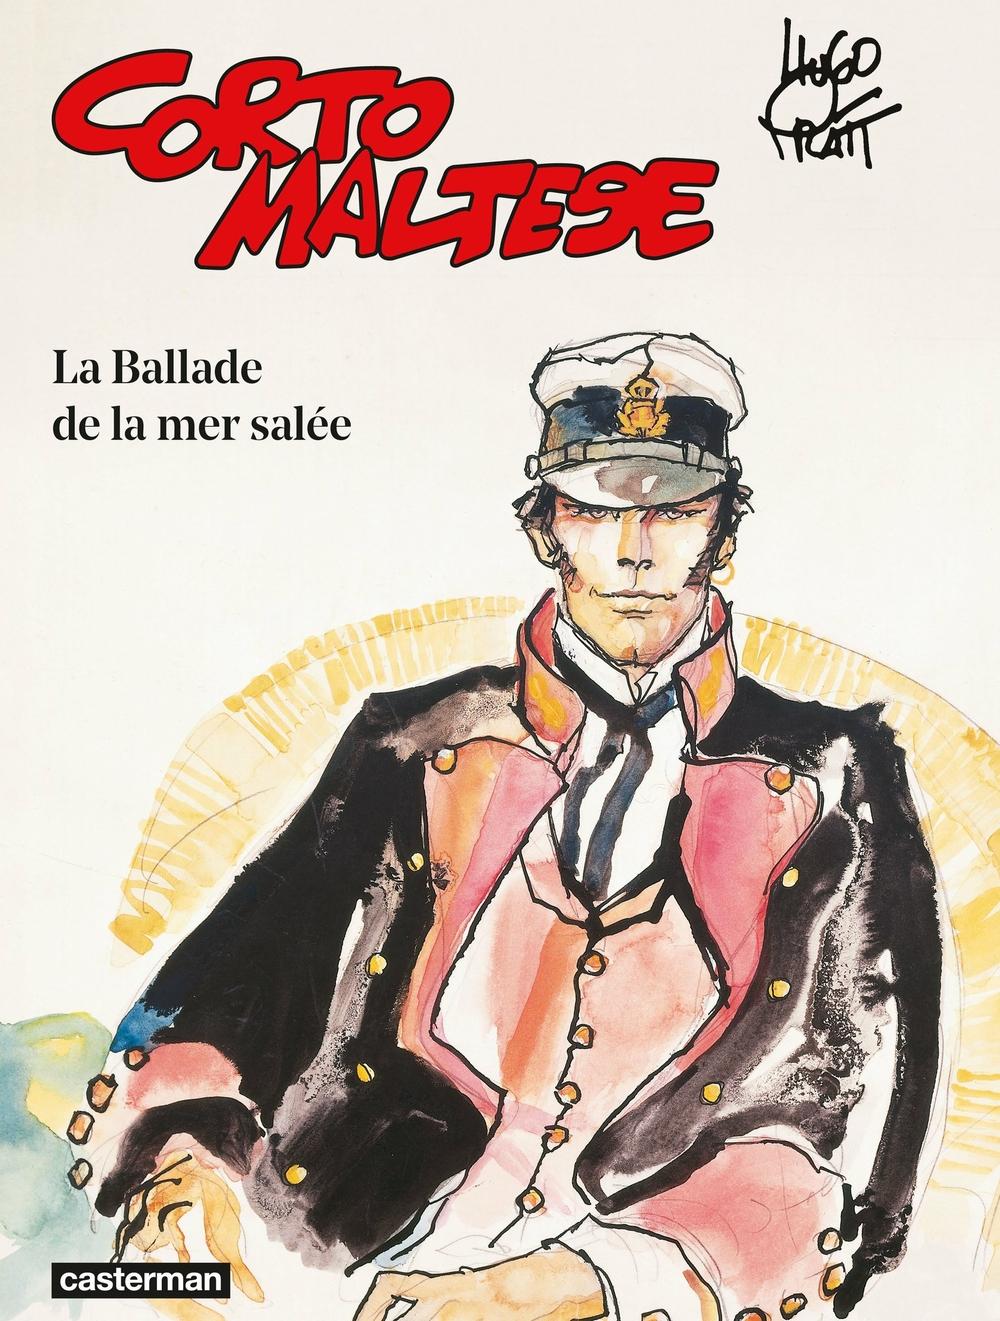 Corto Maltese (Tome 1) - La Ballade de la mer salée  